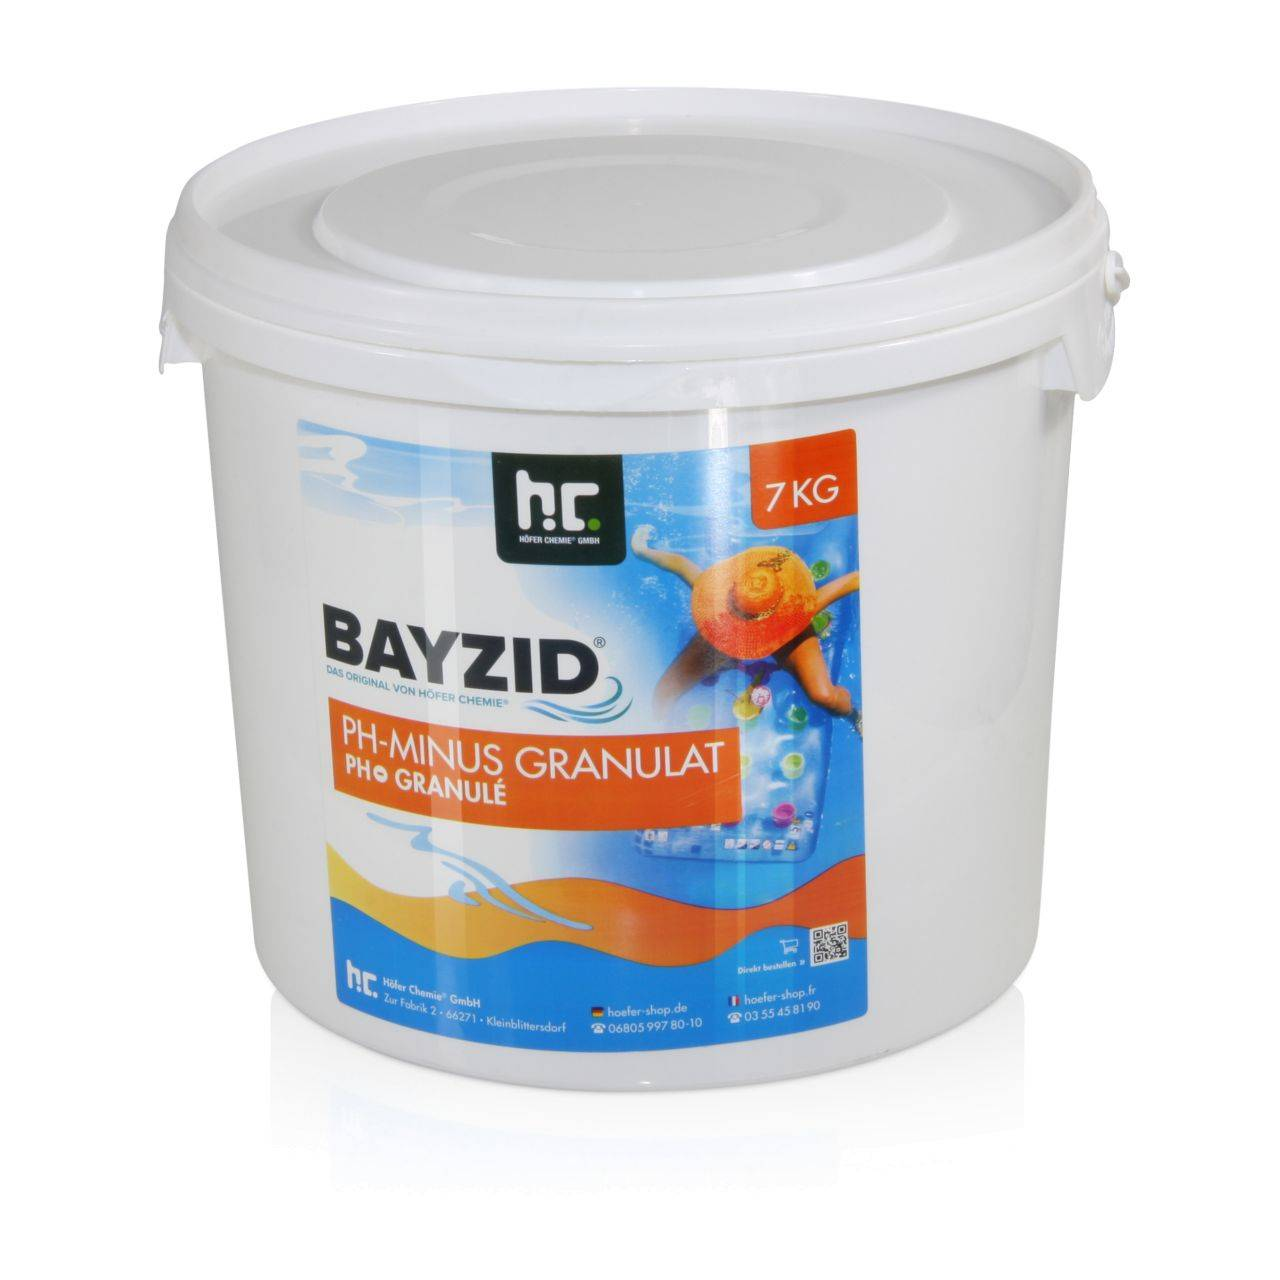 BAYZID 28 kg Bayzid® pH moins granulé (4 x 7 kg)